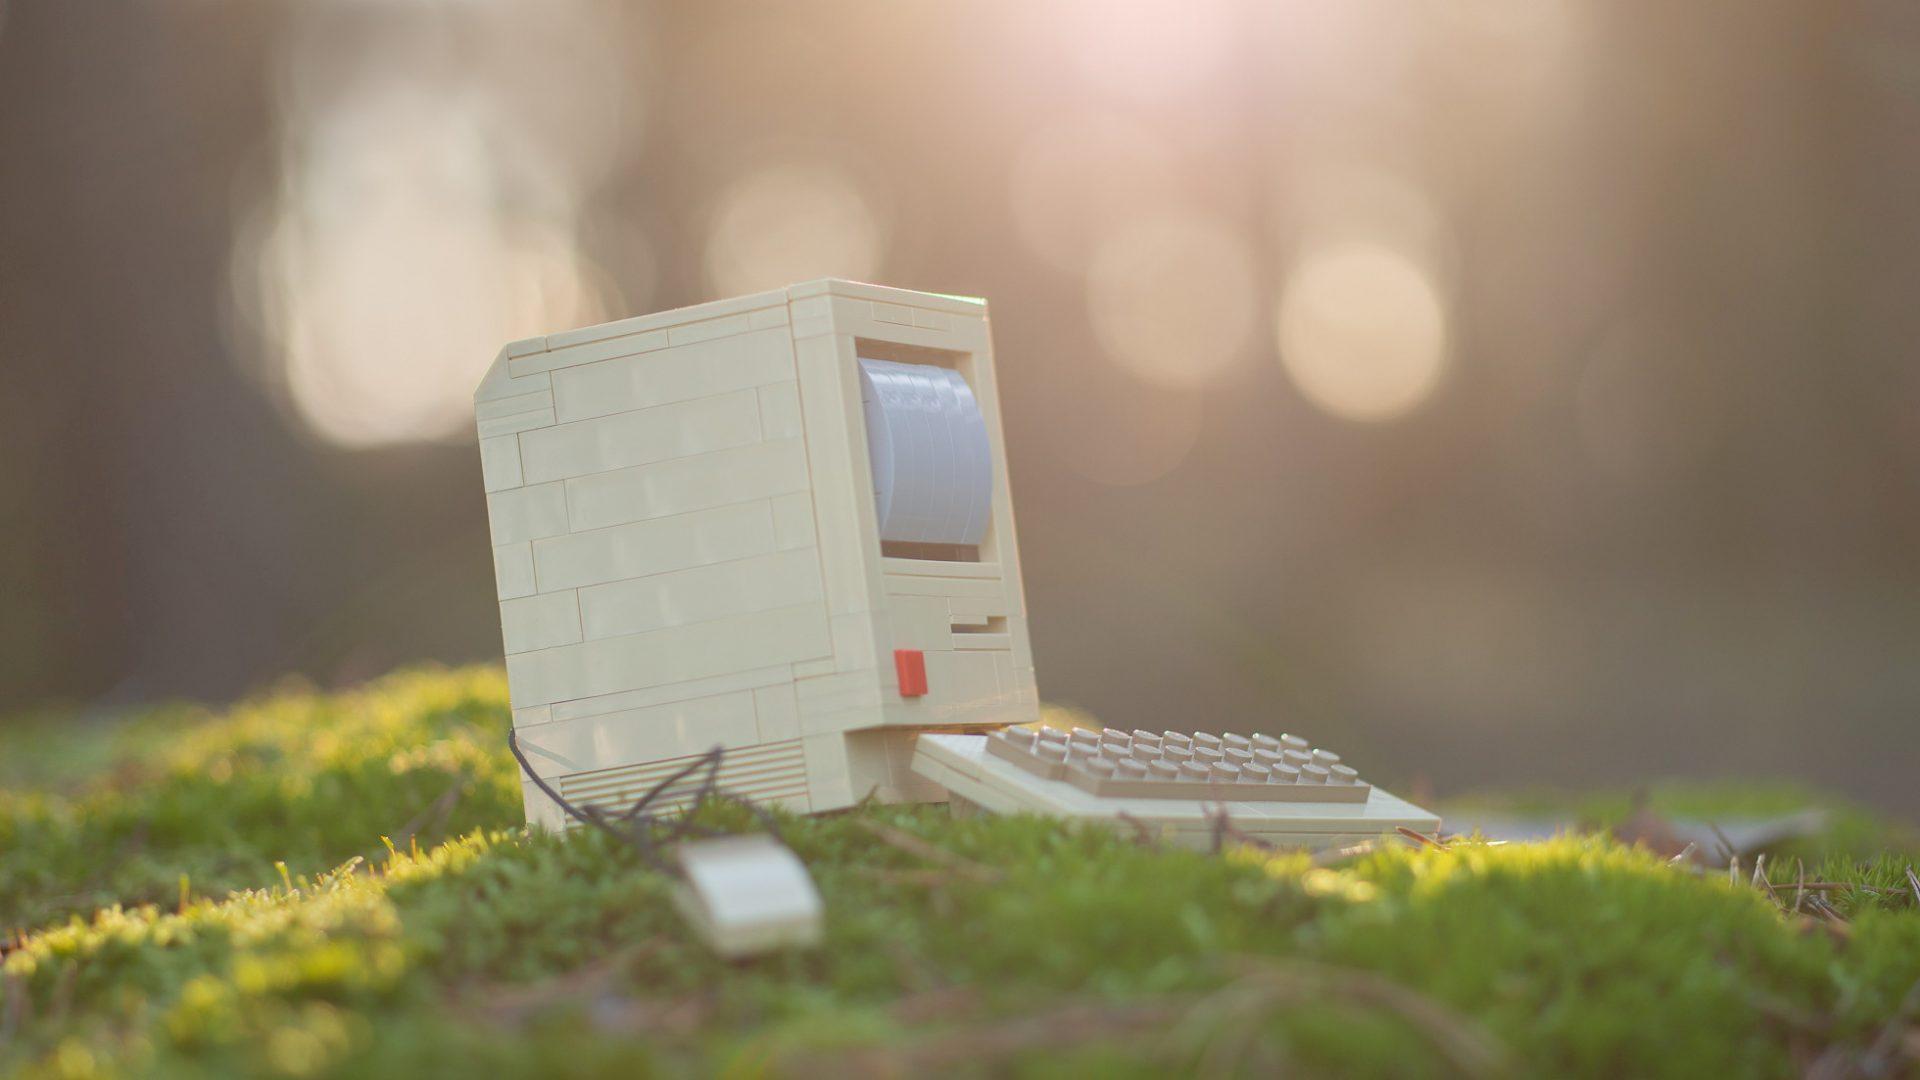 Plastdator i skogen.